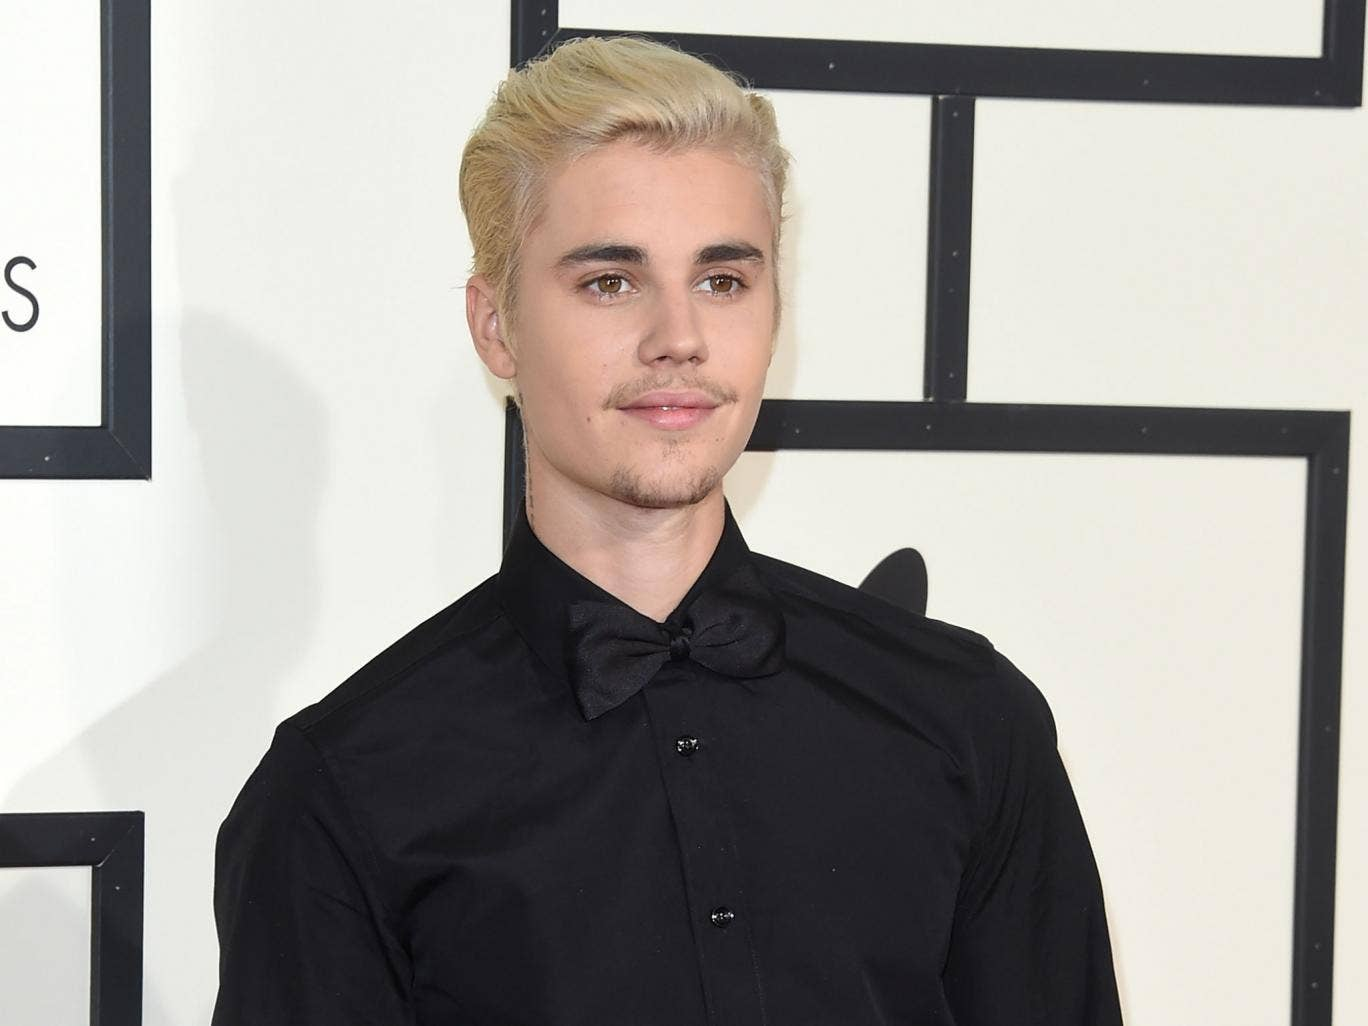 Grammys 2016 justin bieber celebrates first win with carpool karaoke